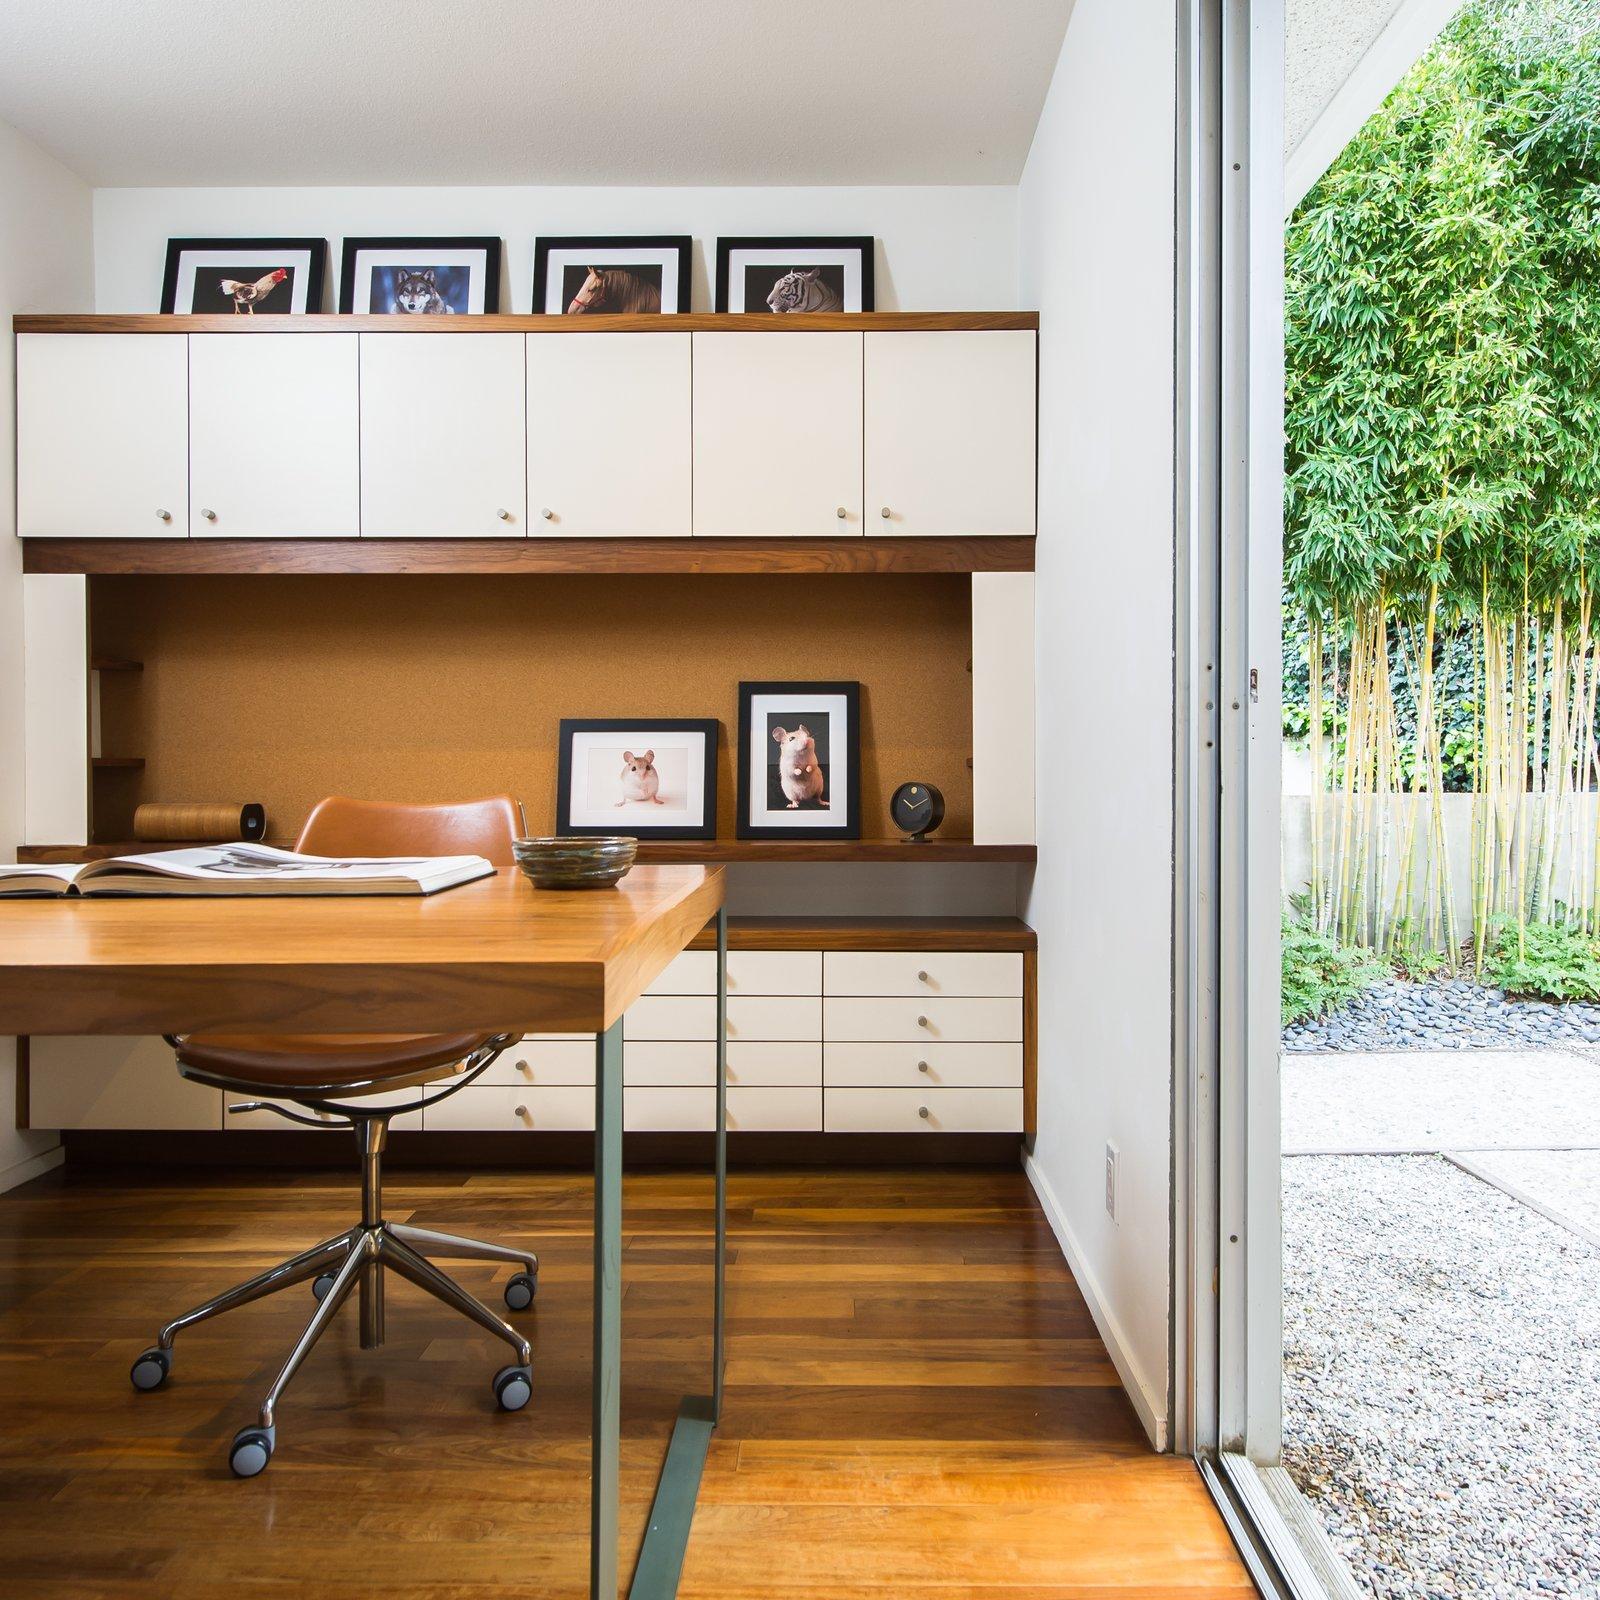 Buff & Hensman Midcentury Home living room office